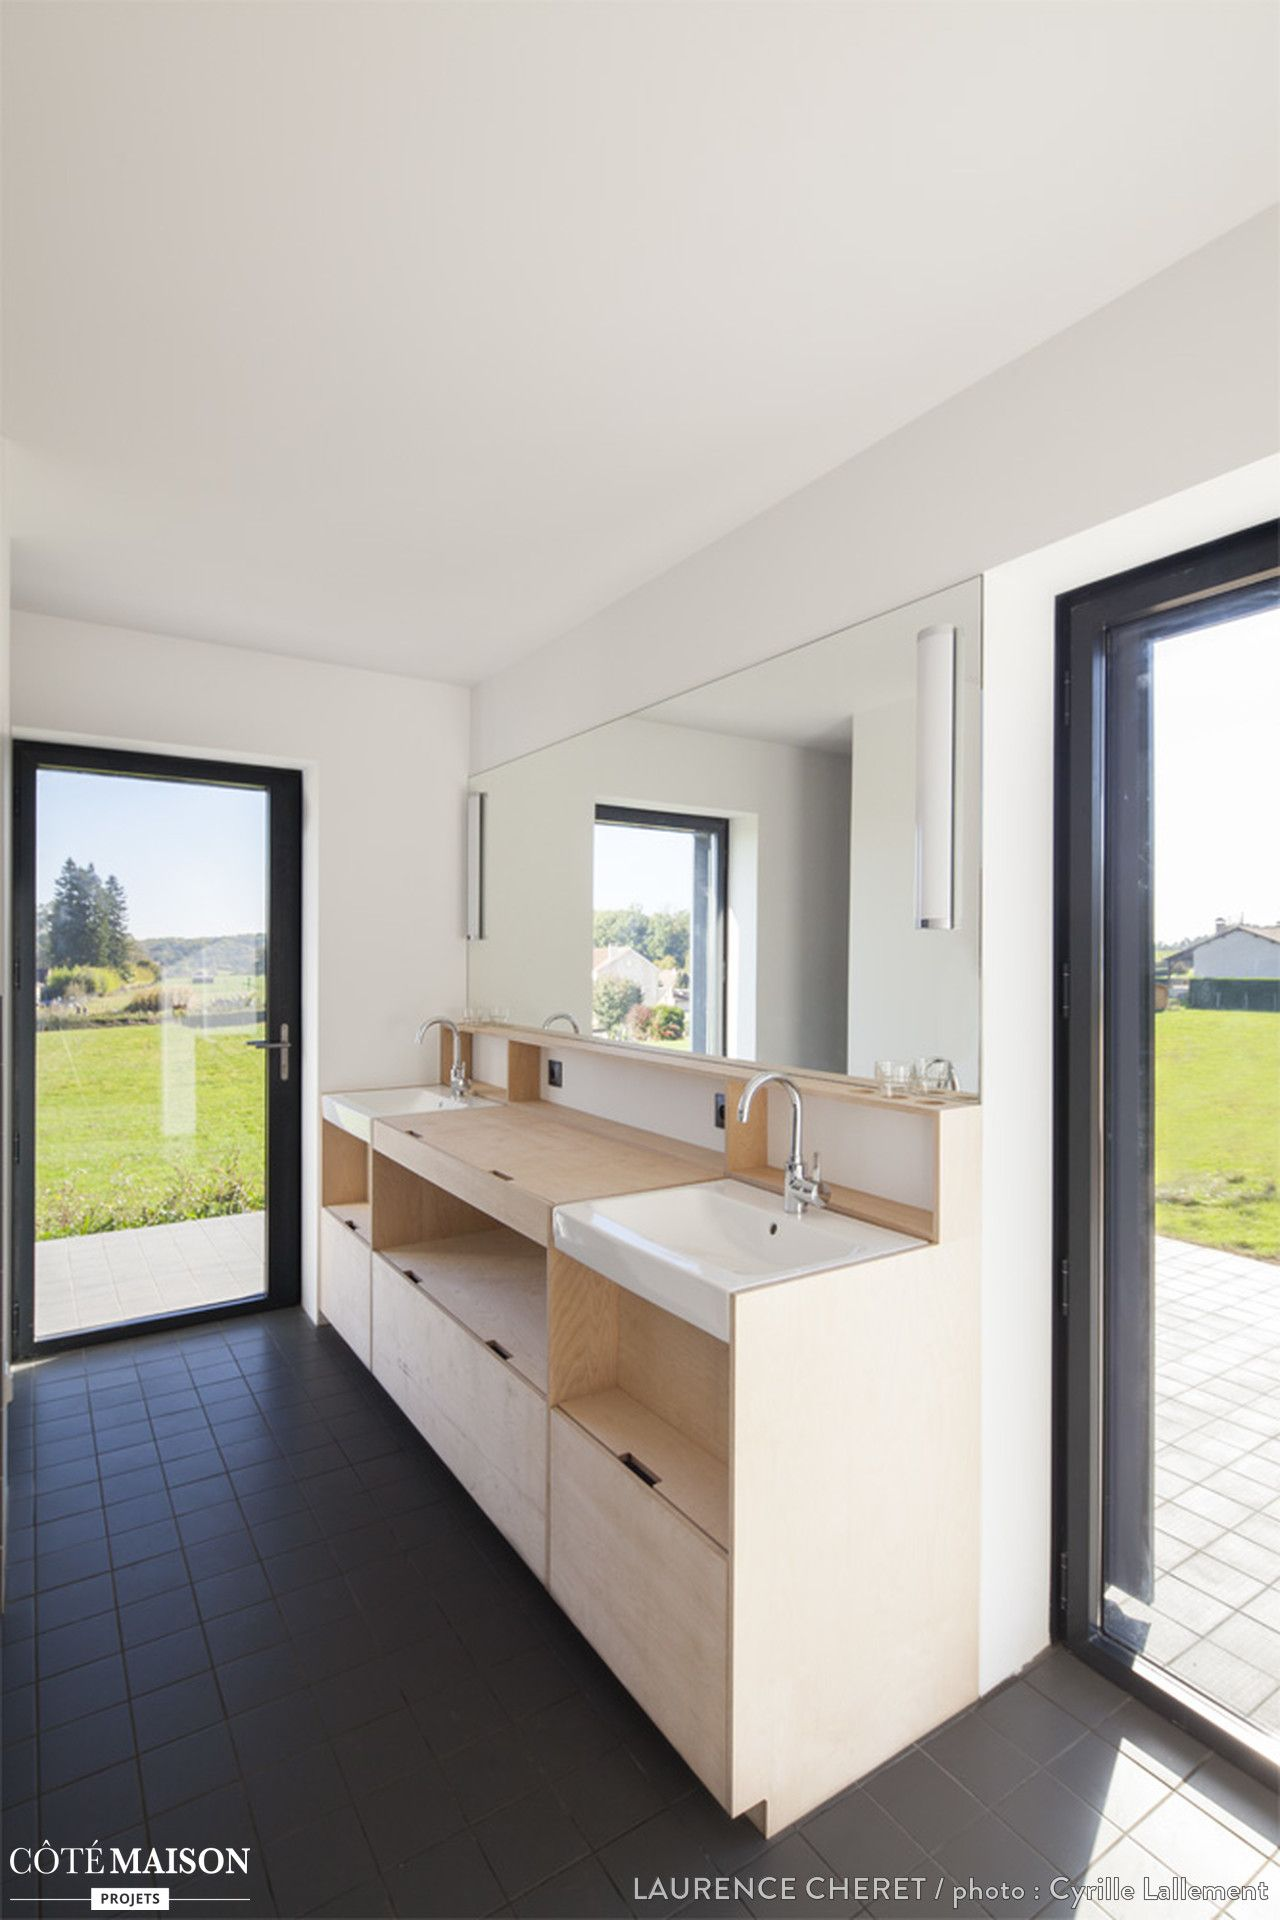 Salle de bains moderne avec sol en carrelage noir, grand meuble ...